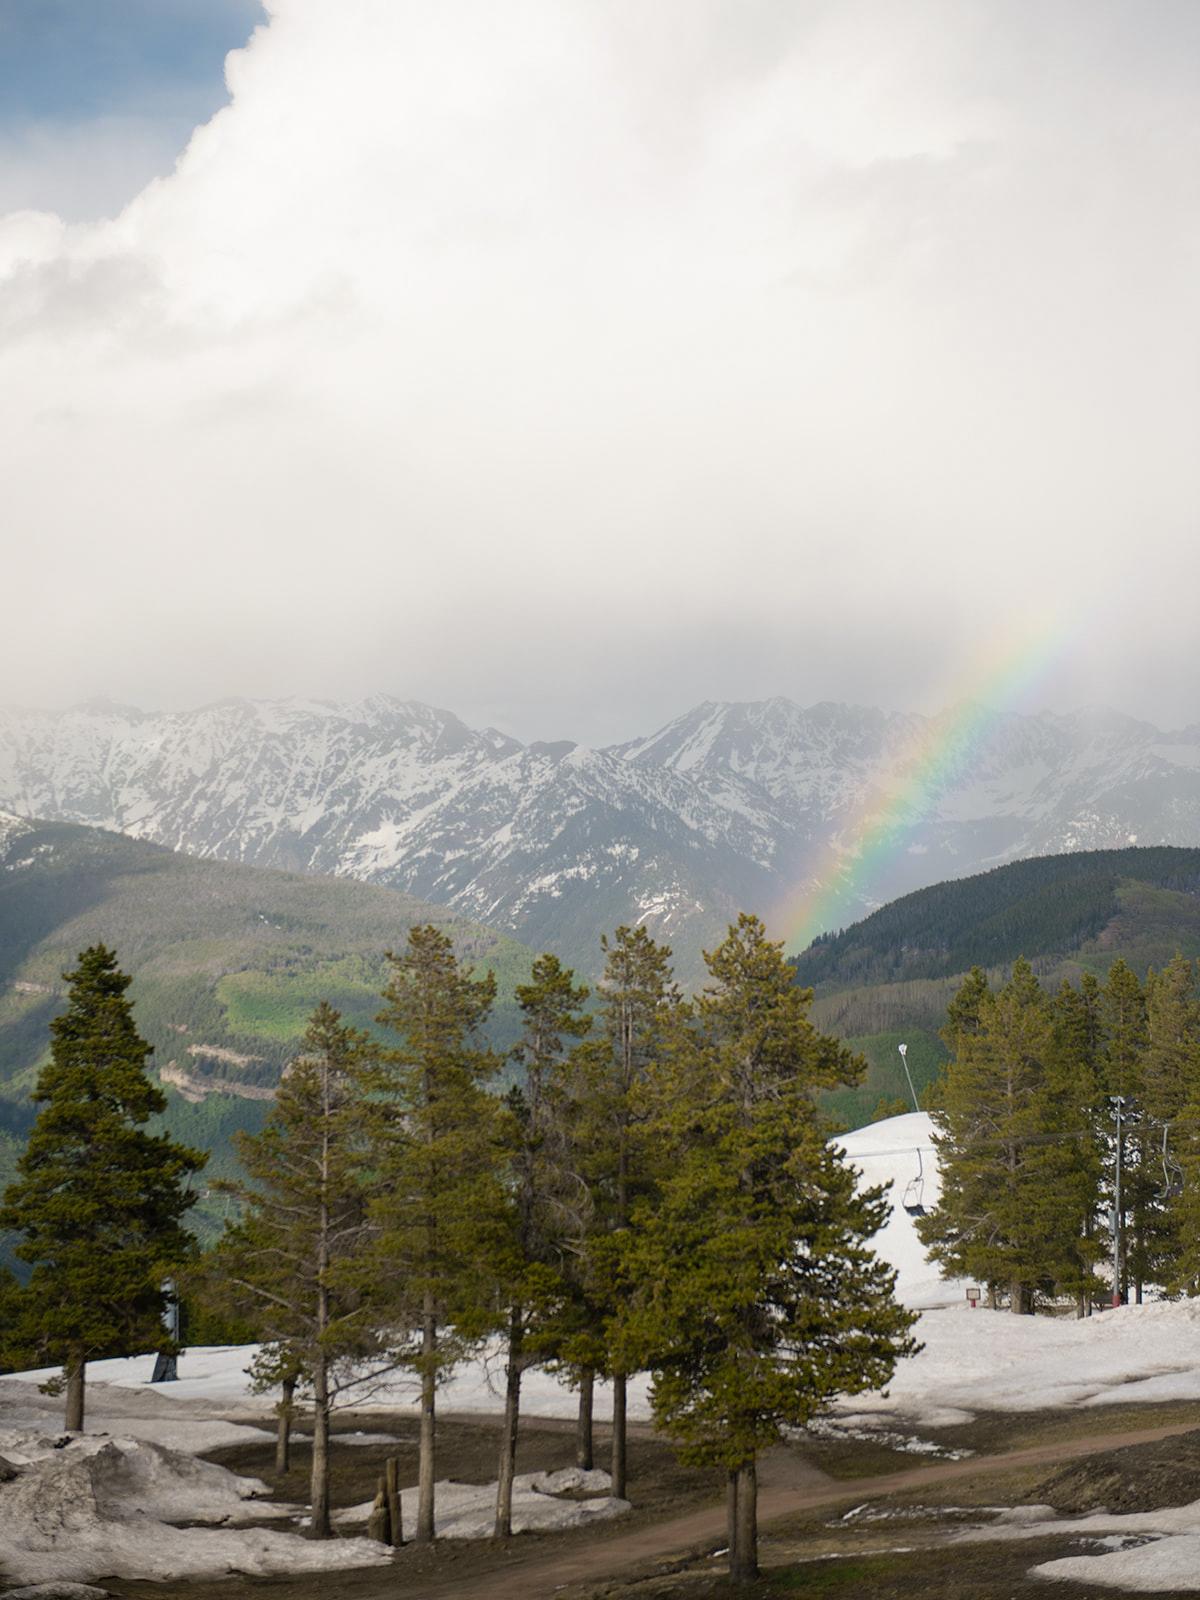 Colorado mountain view fog rainbow scene